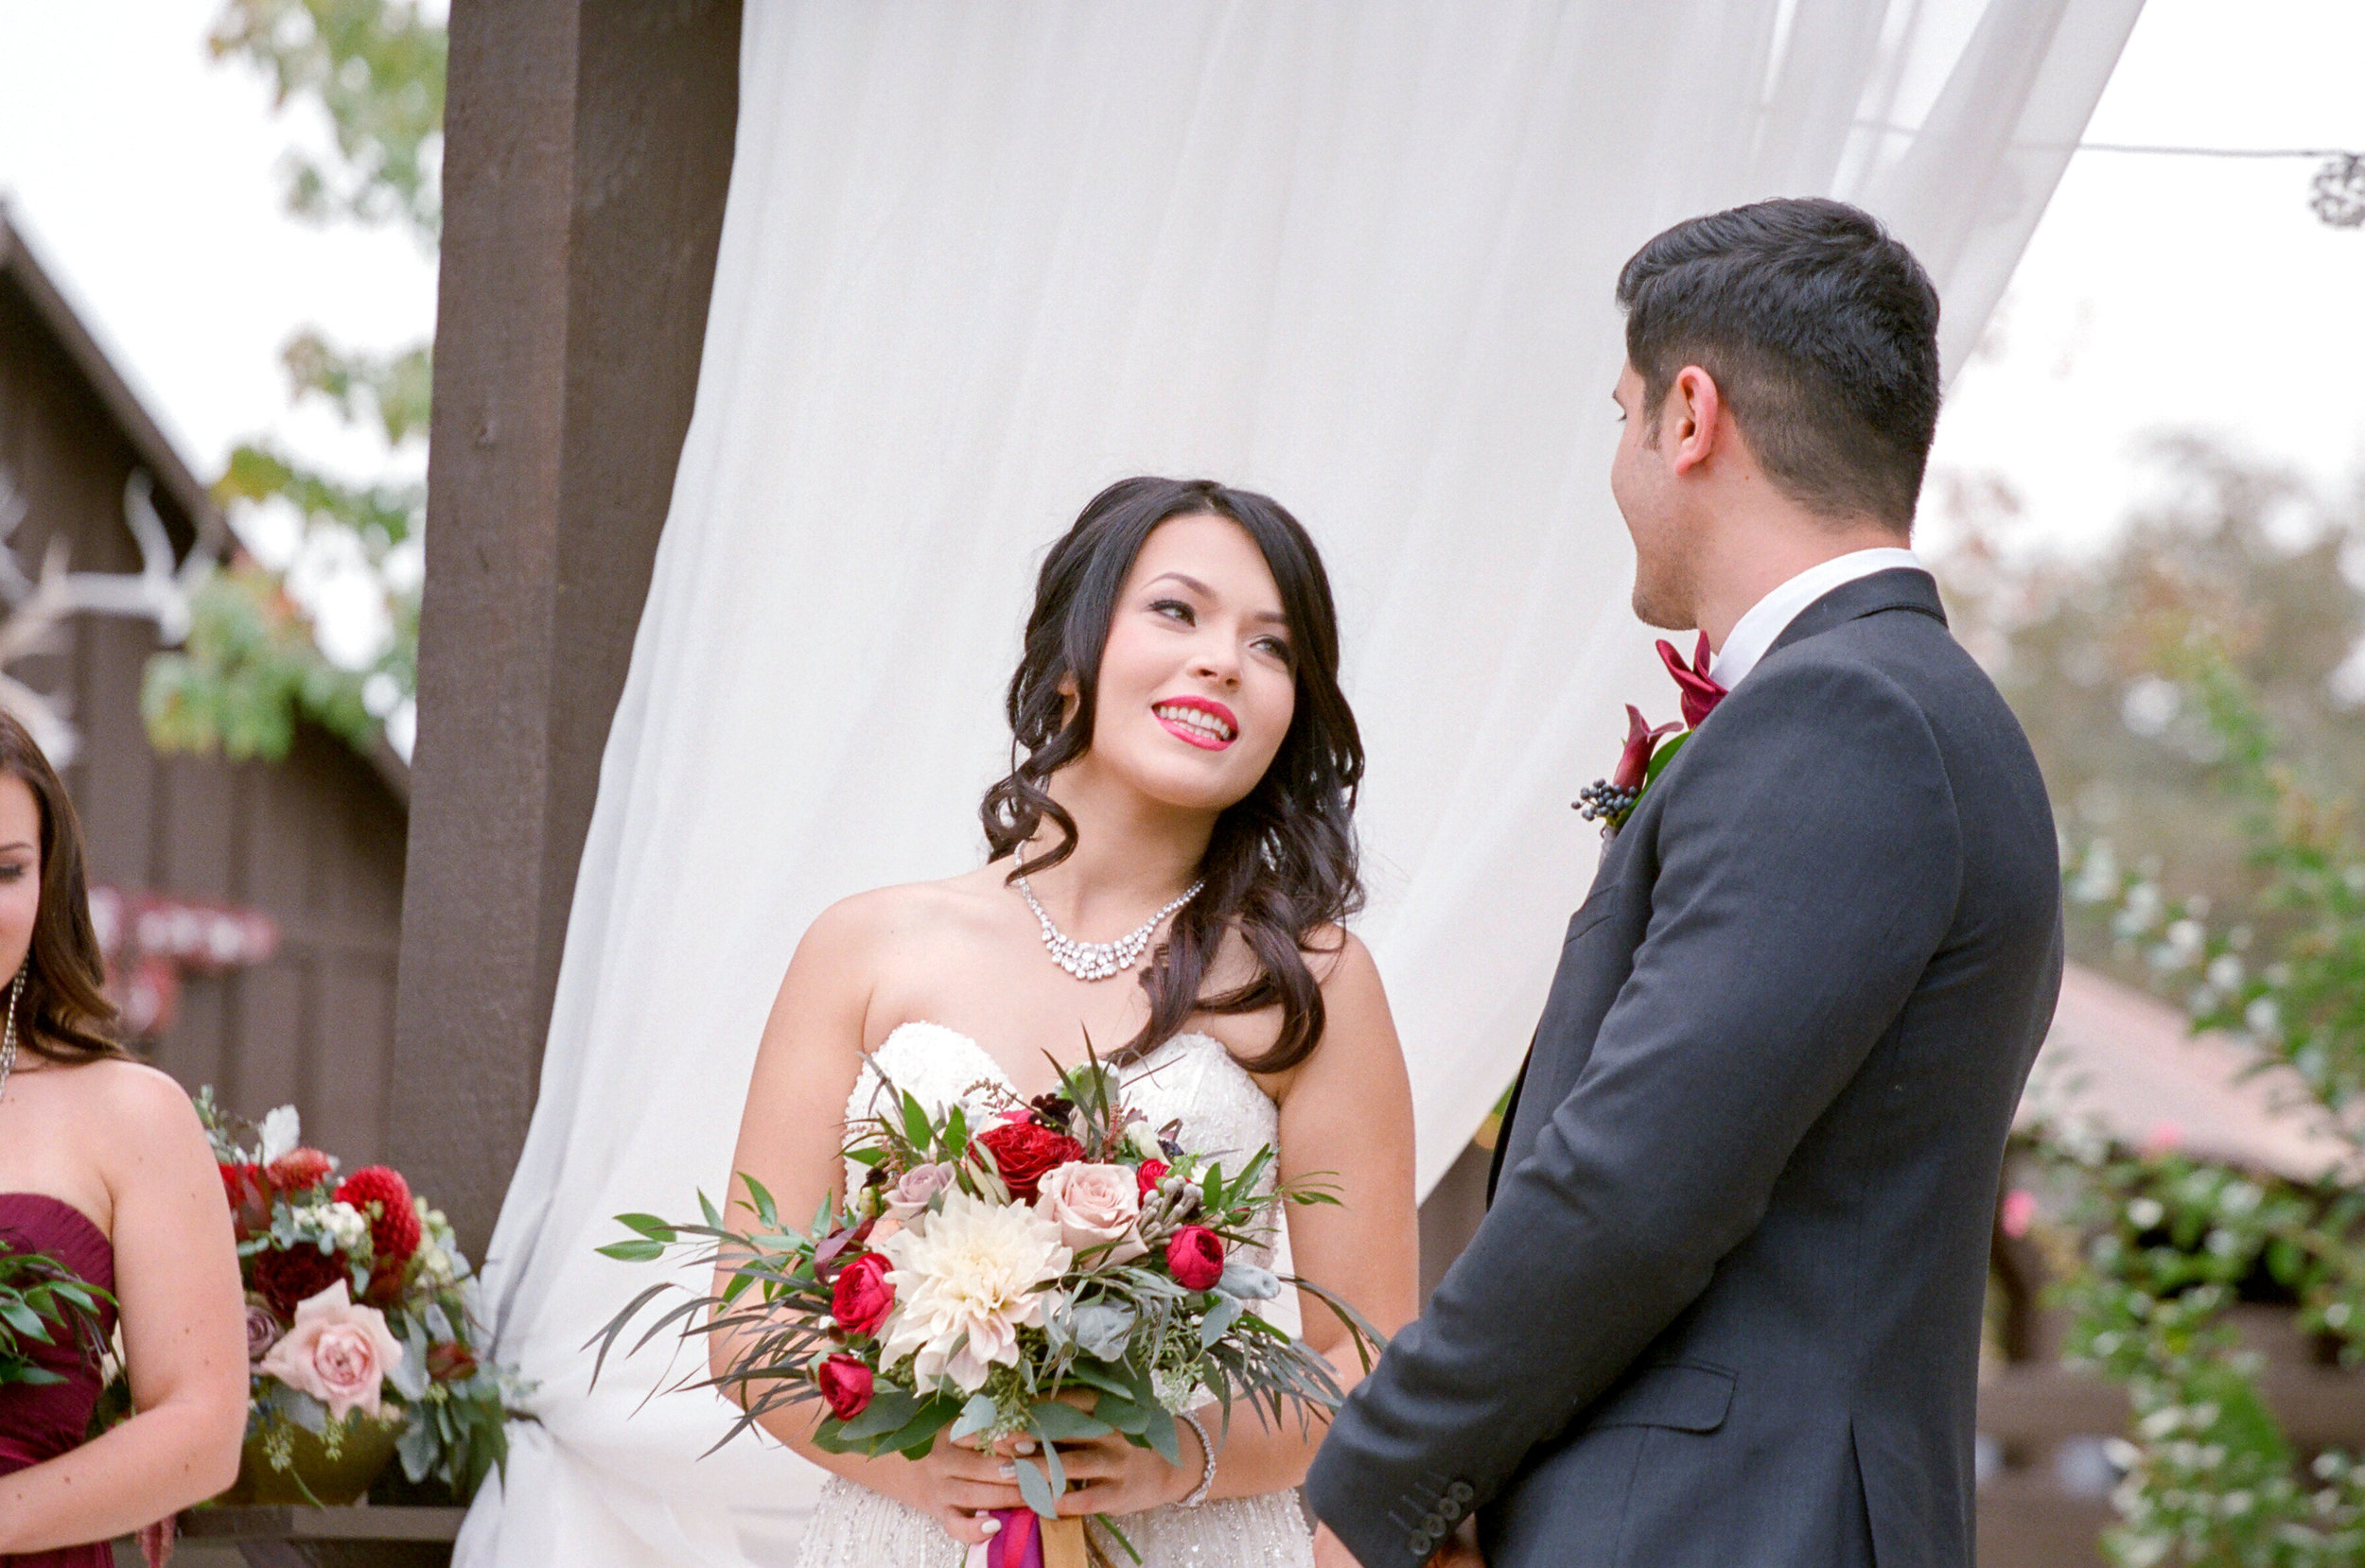 Amador_County_Wedding_Bride_Groom_Vows_Bouquet_Draping_Rancho_Victoria_Vineyard_Northern_California.jpg